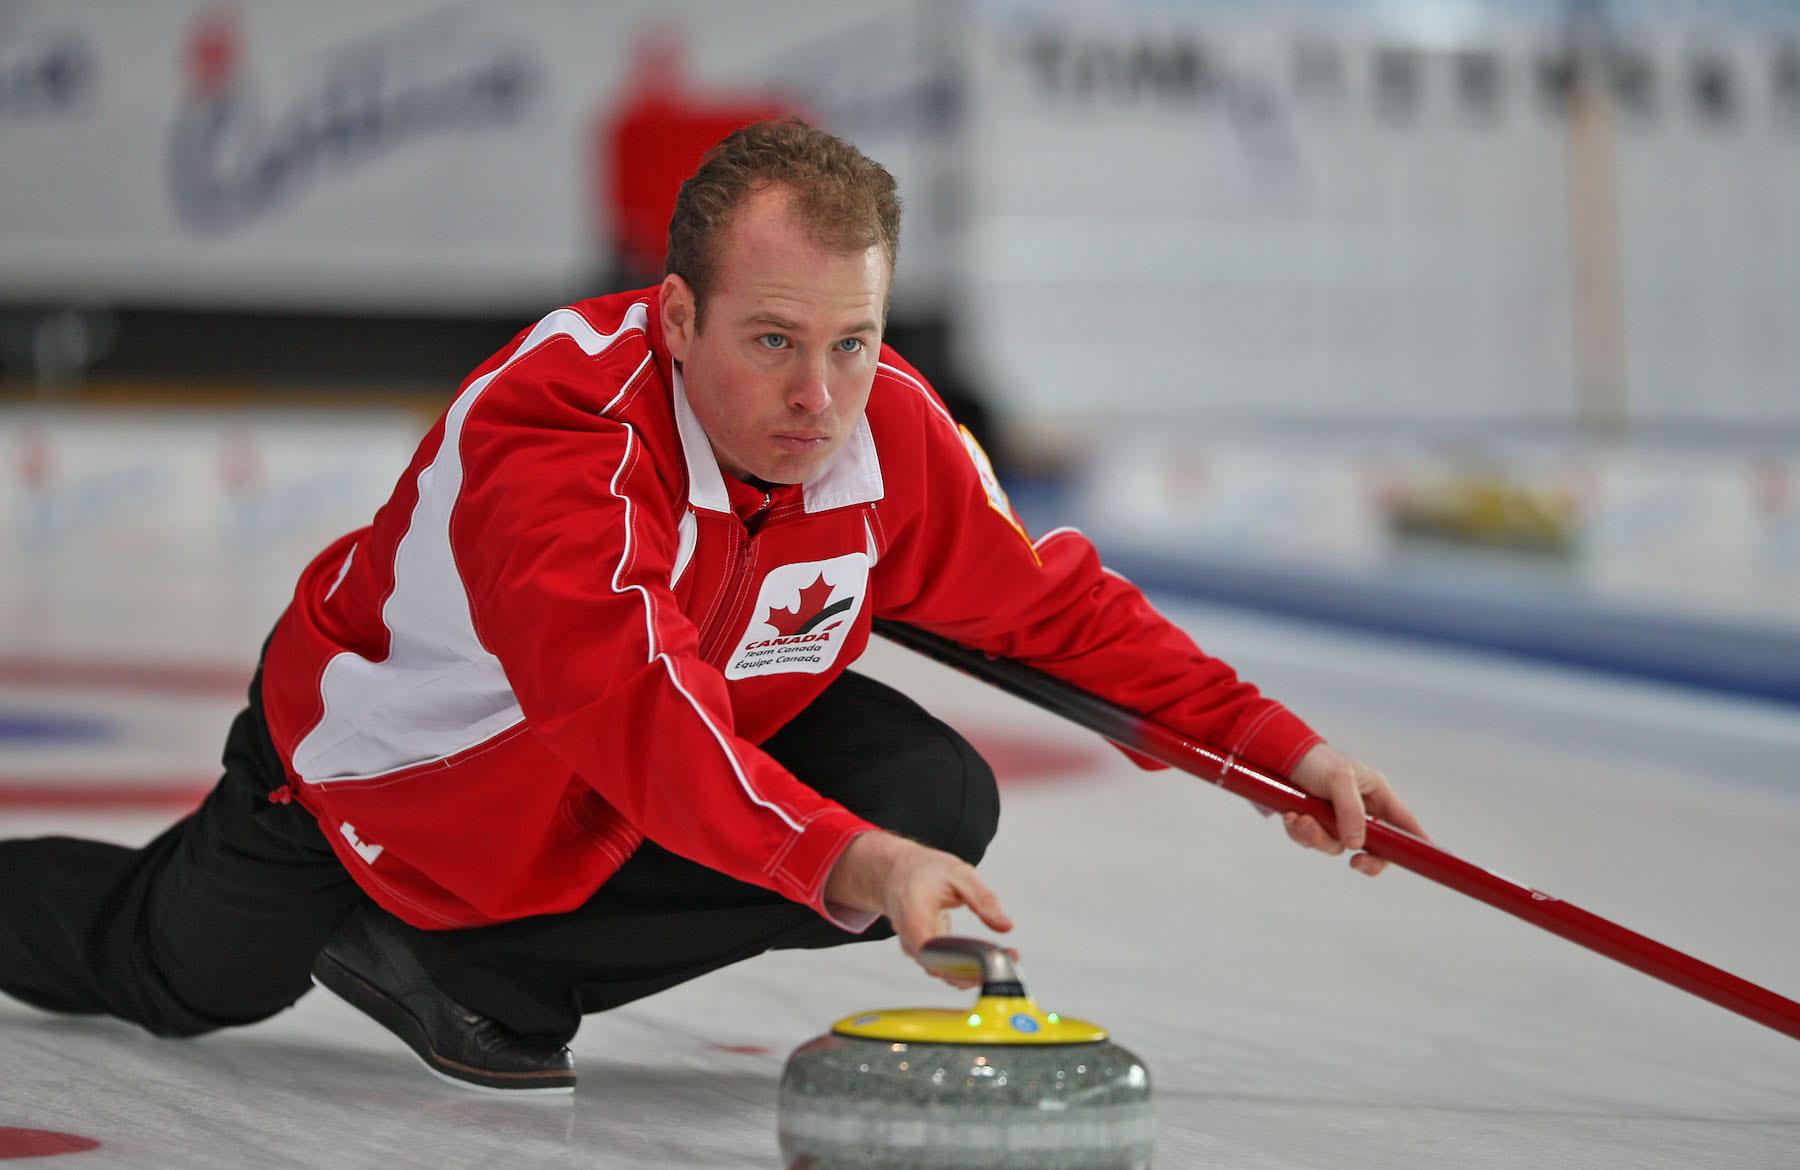 Sean Grassie curling